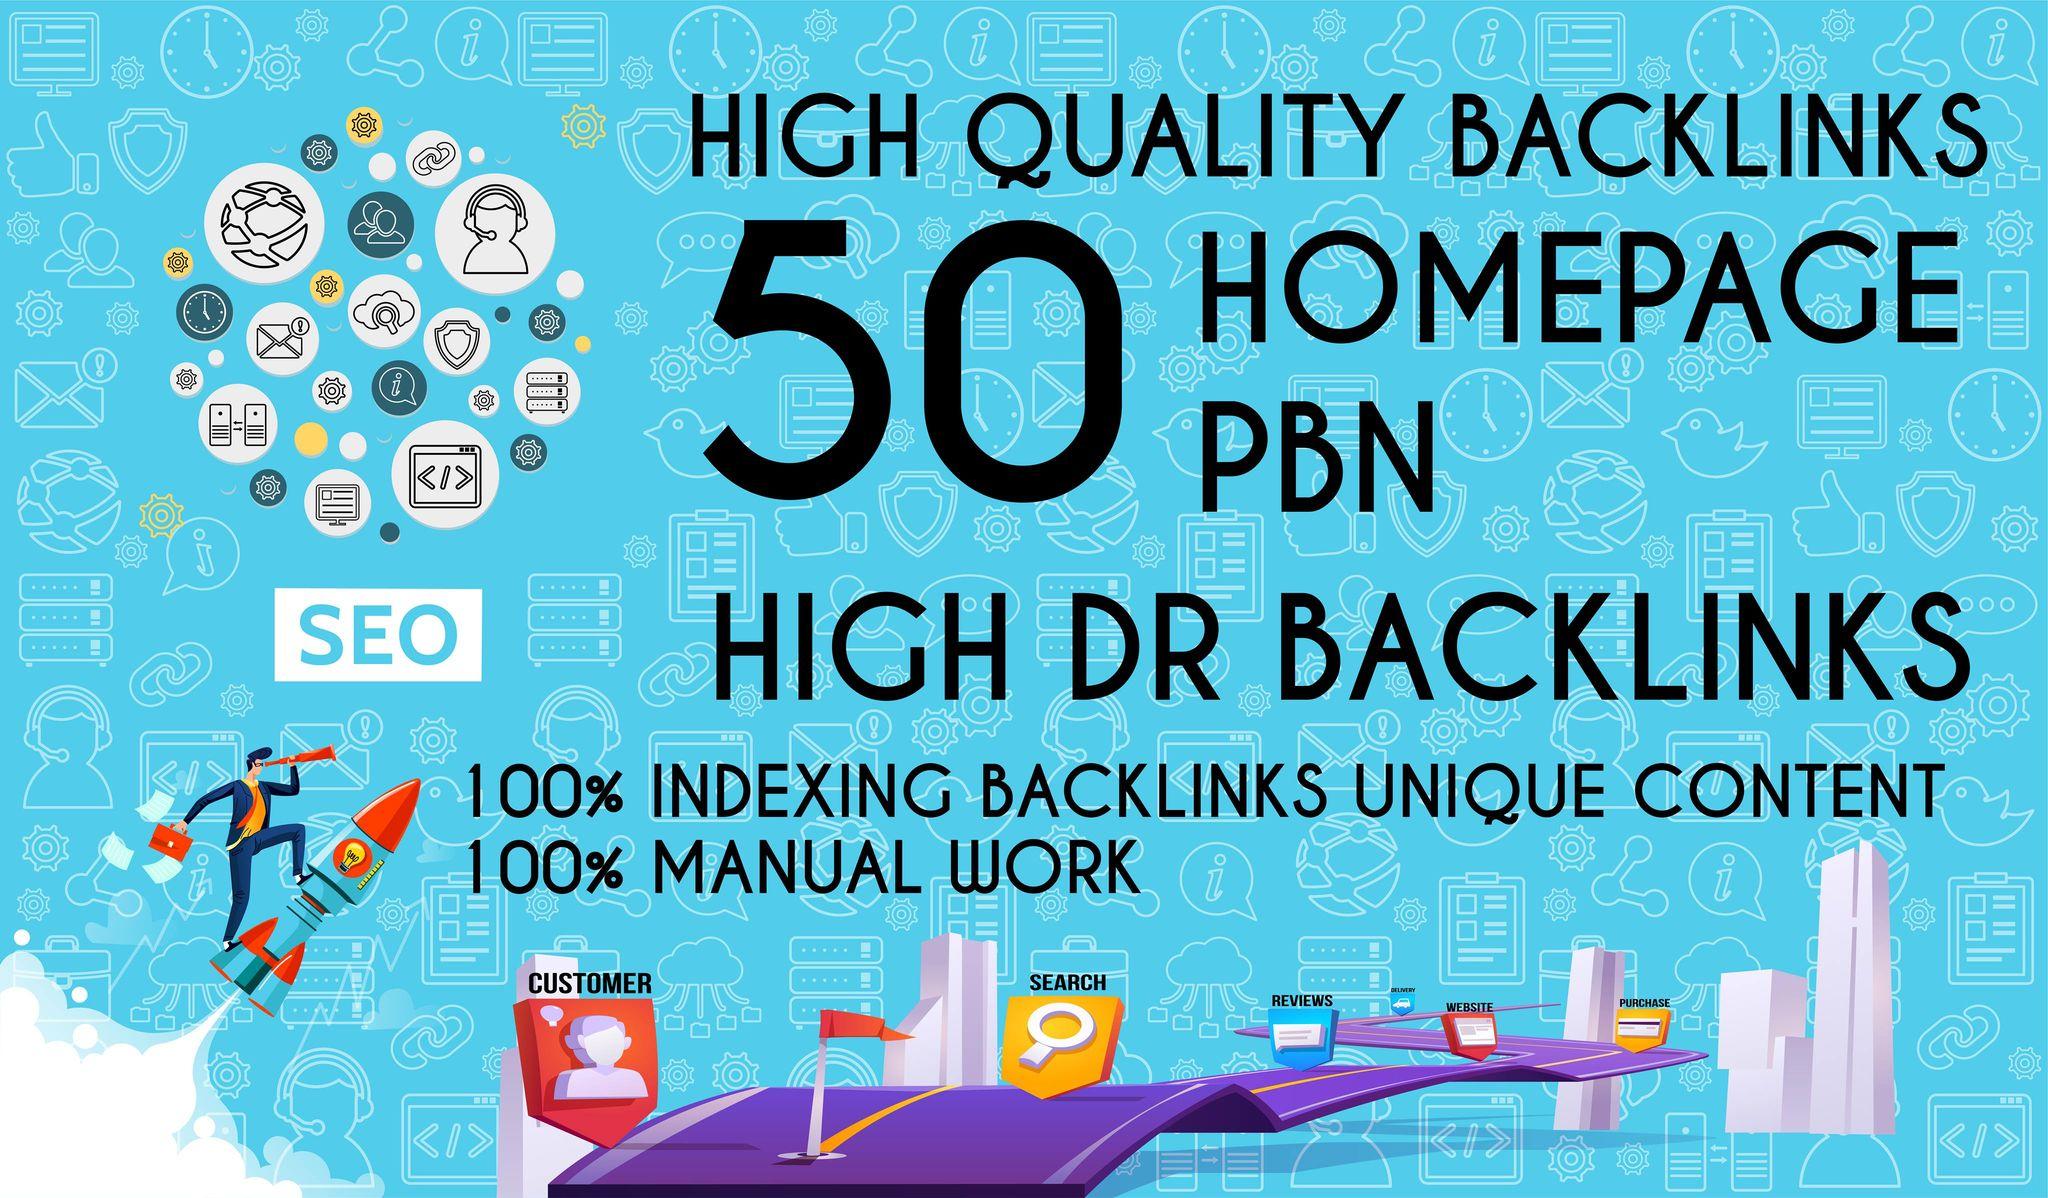 Get 50 Dofollow Homepage PBN Backlinks On High DA 25+